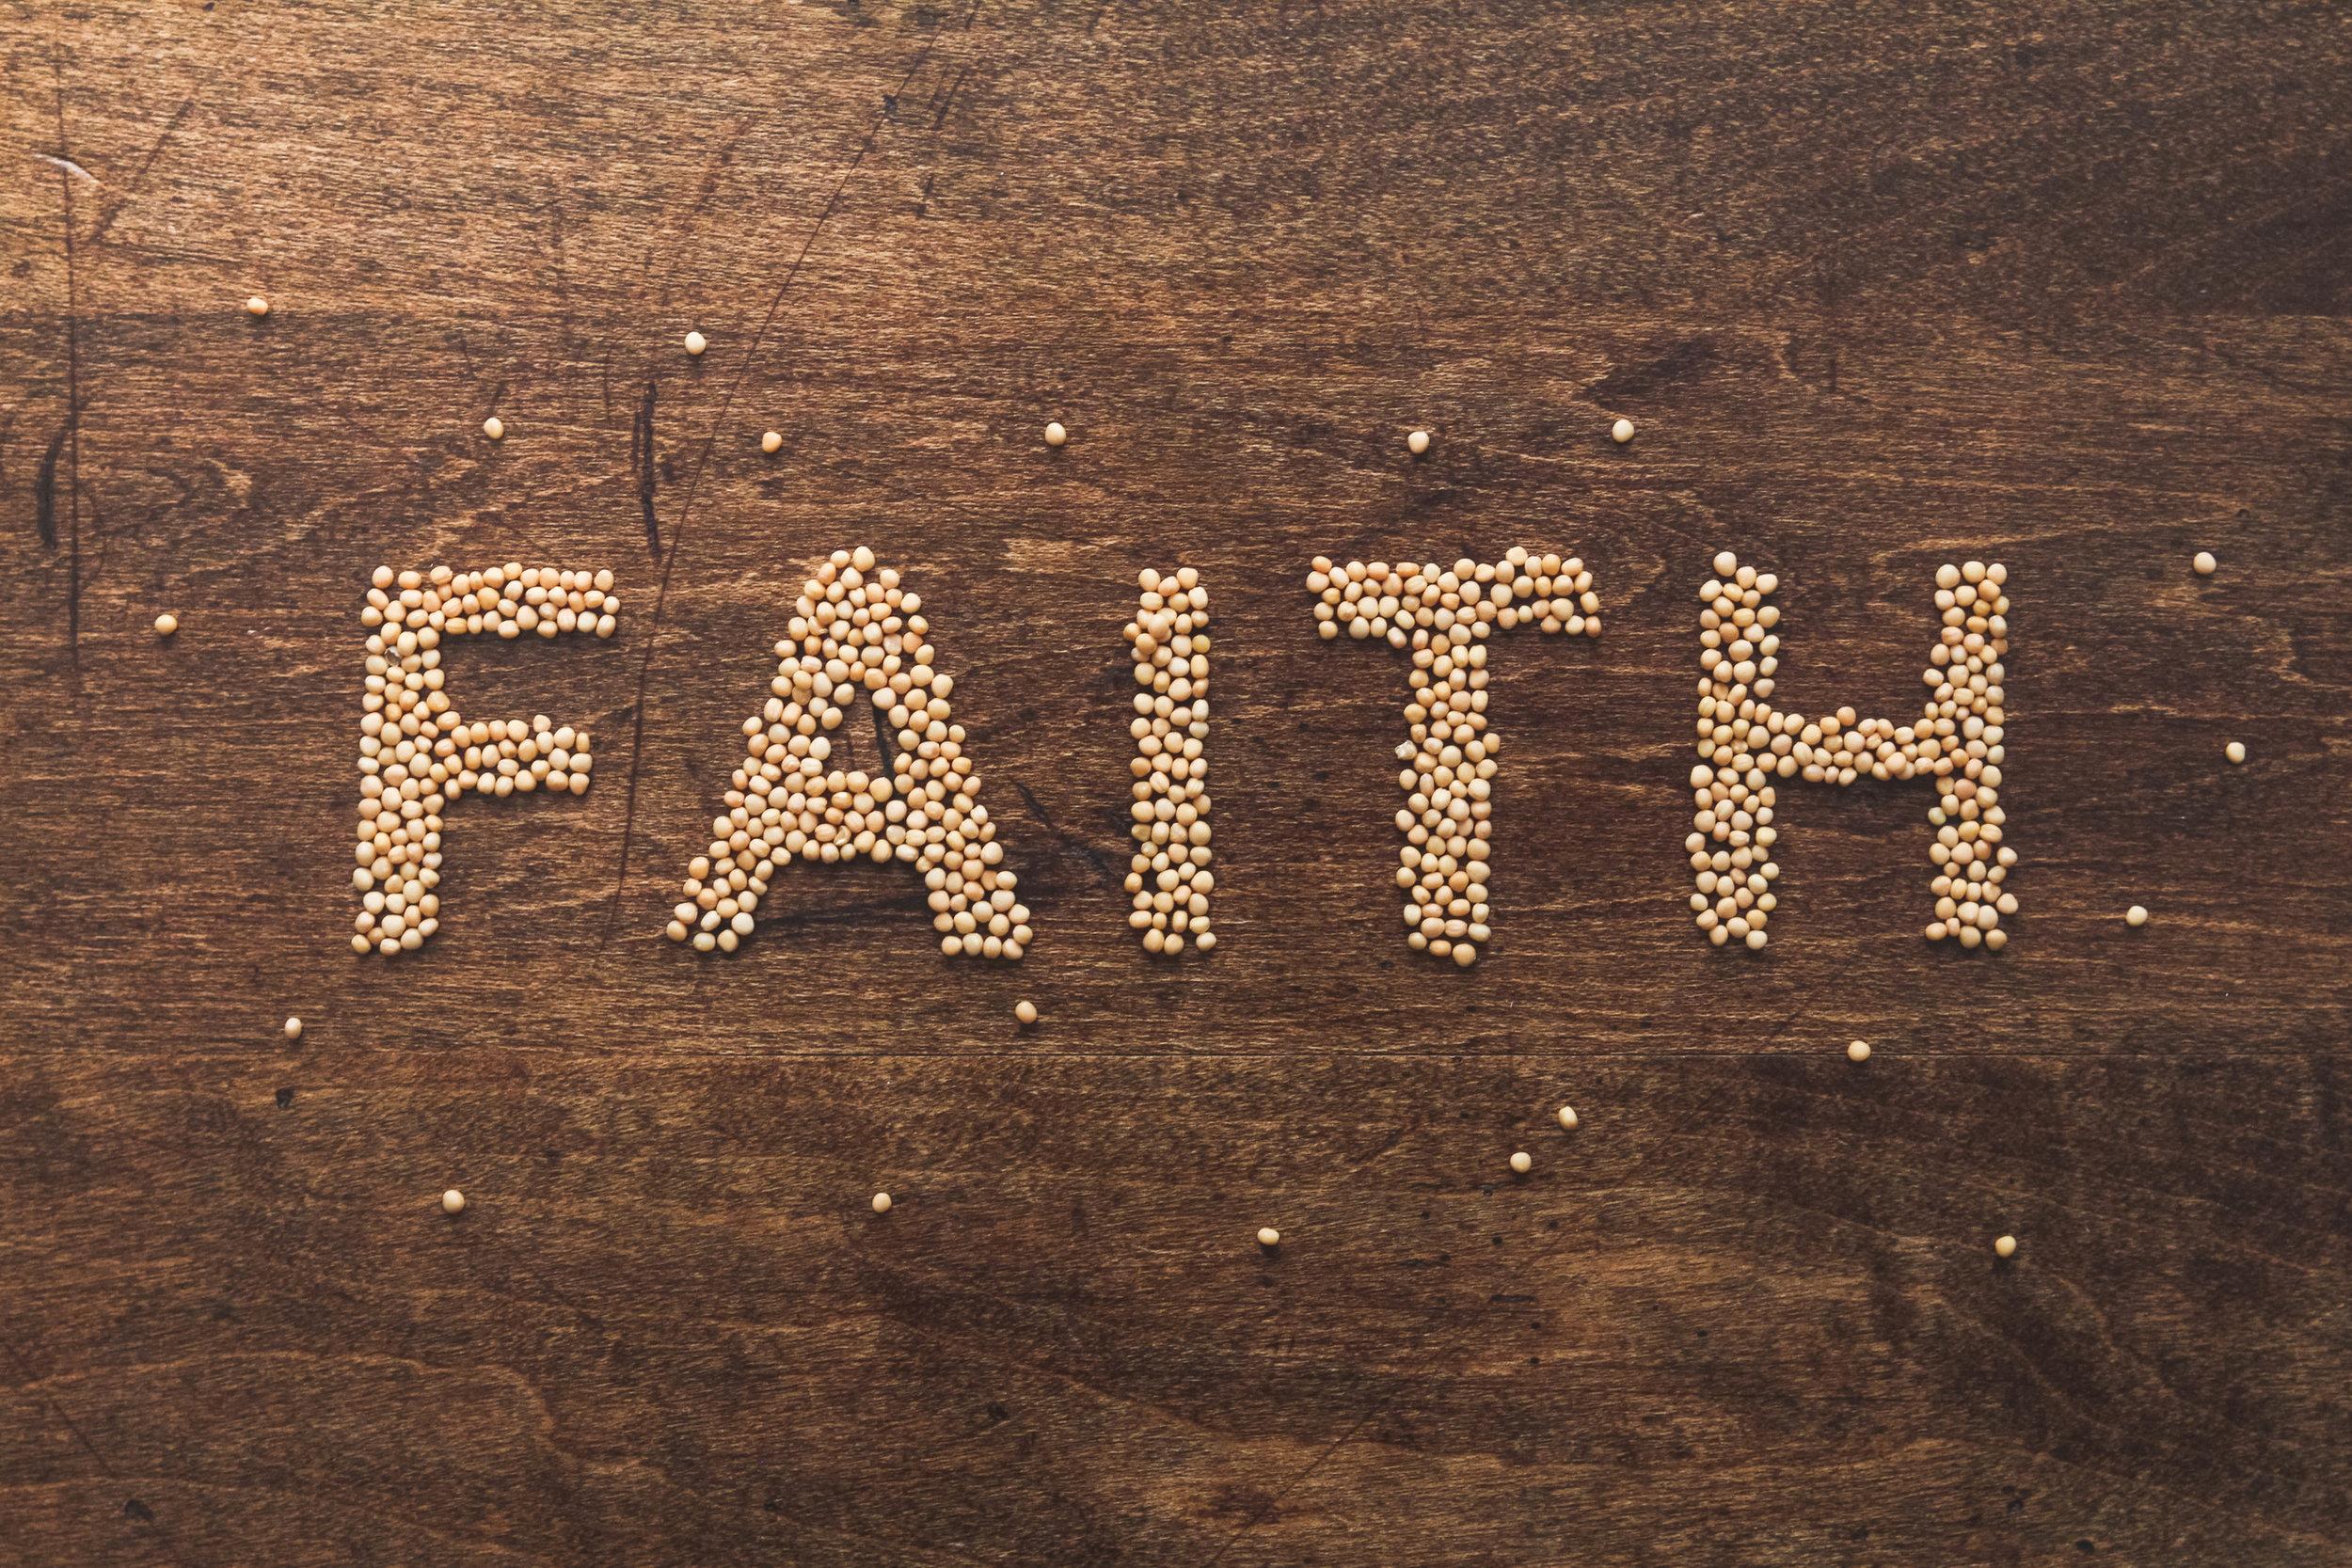 faith mustard seeds.jpg